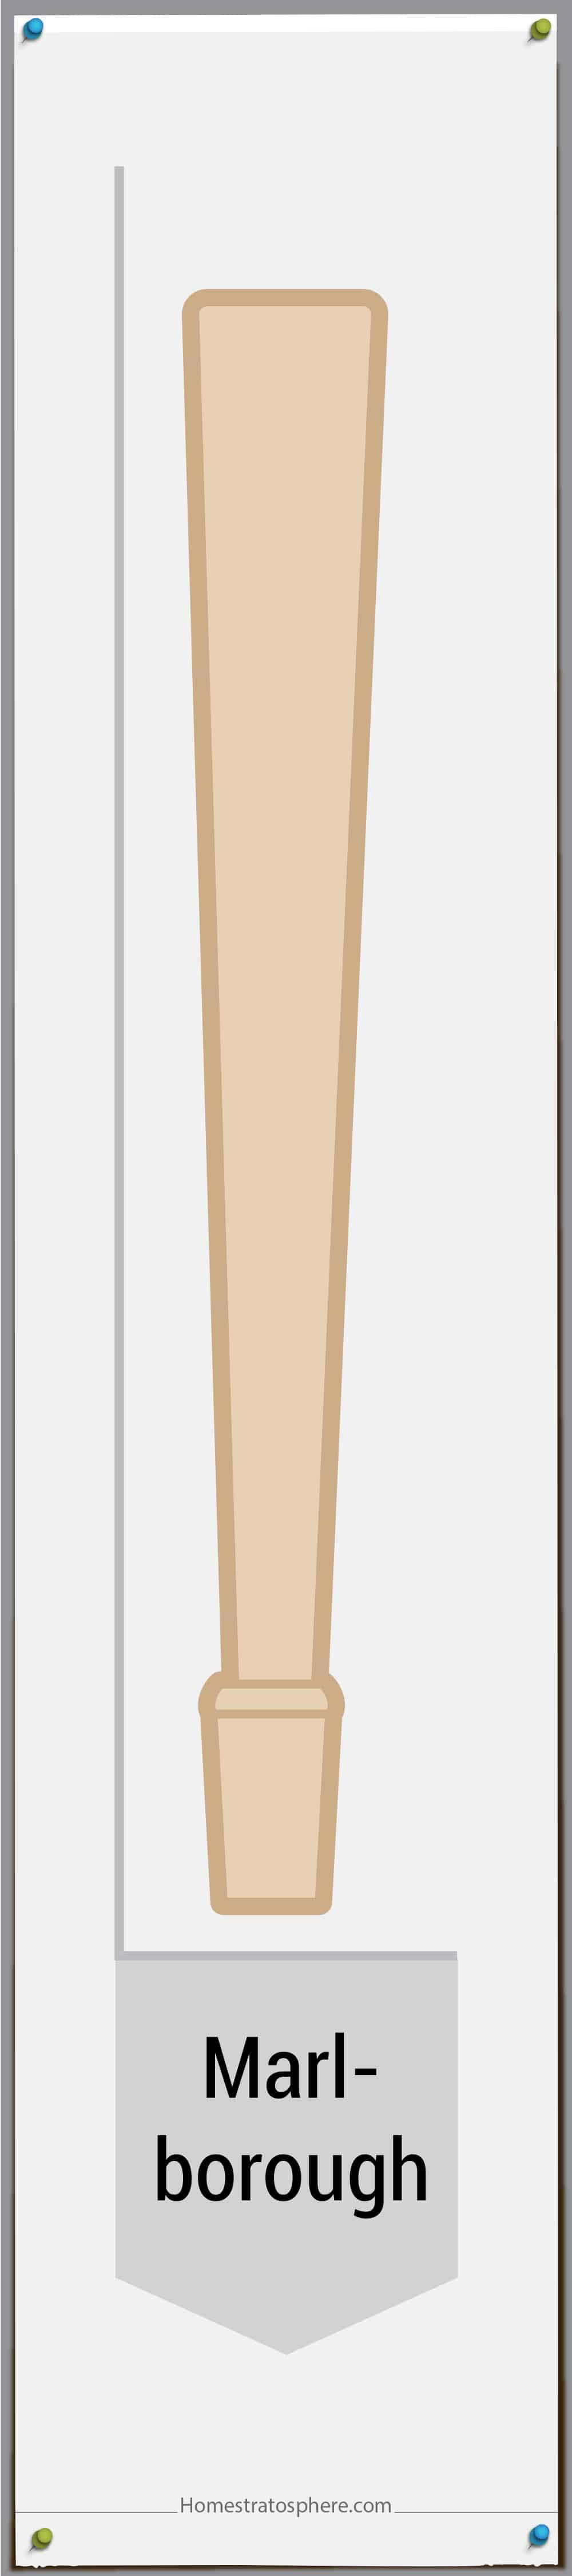 Marlborough leg style